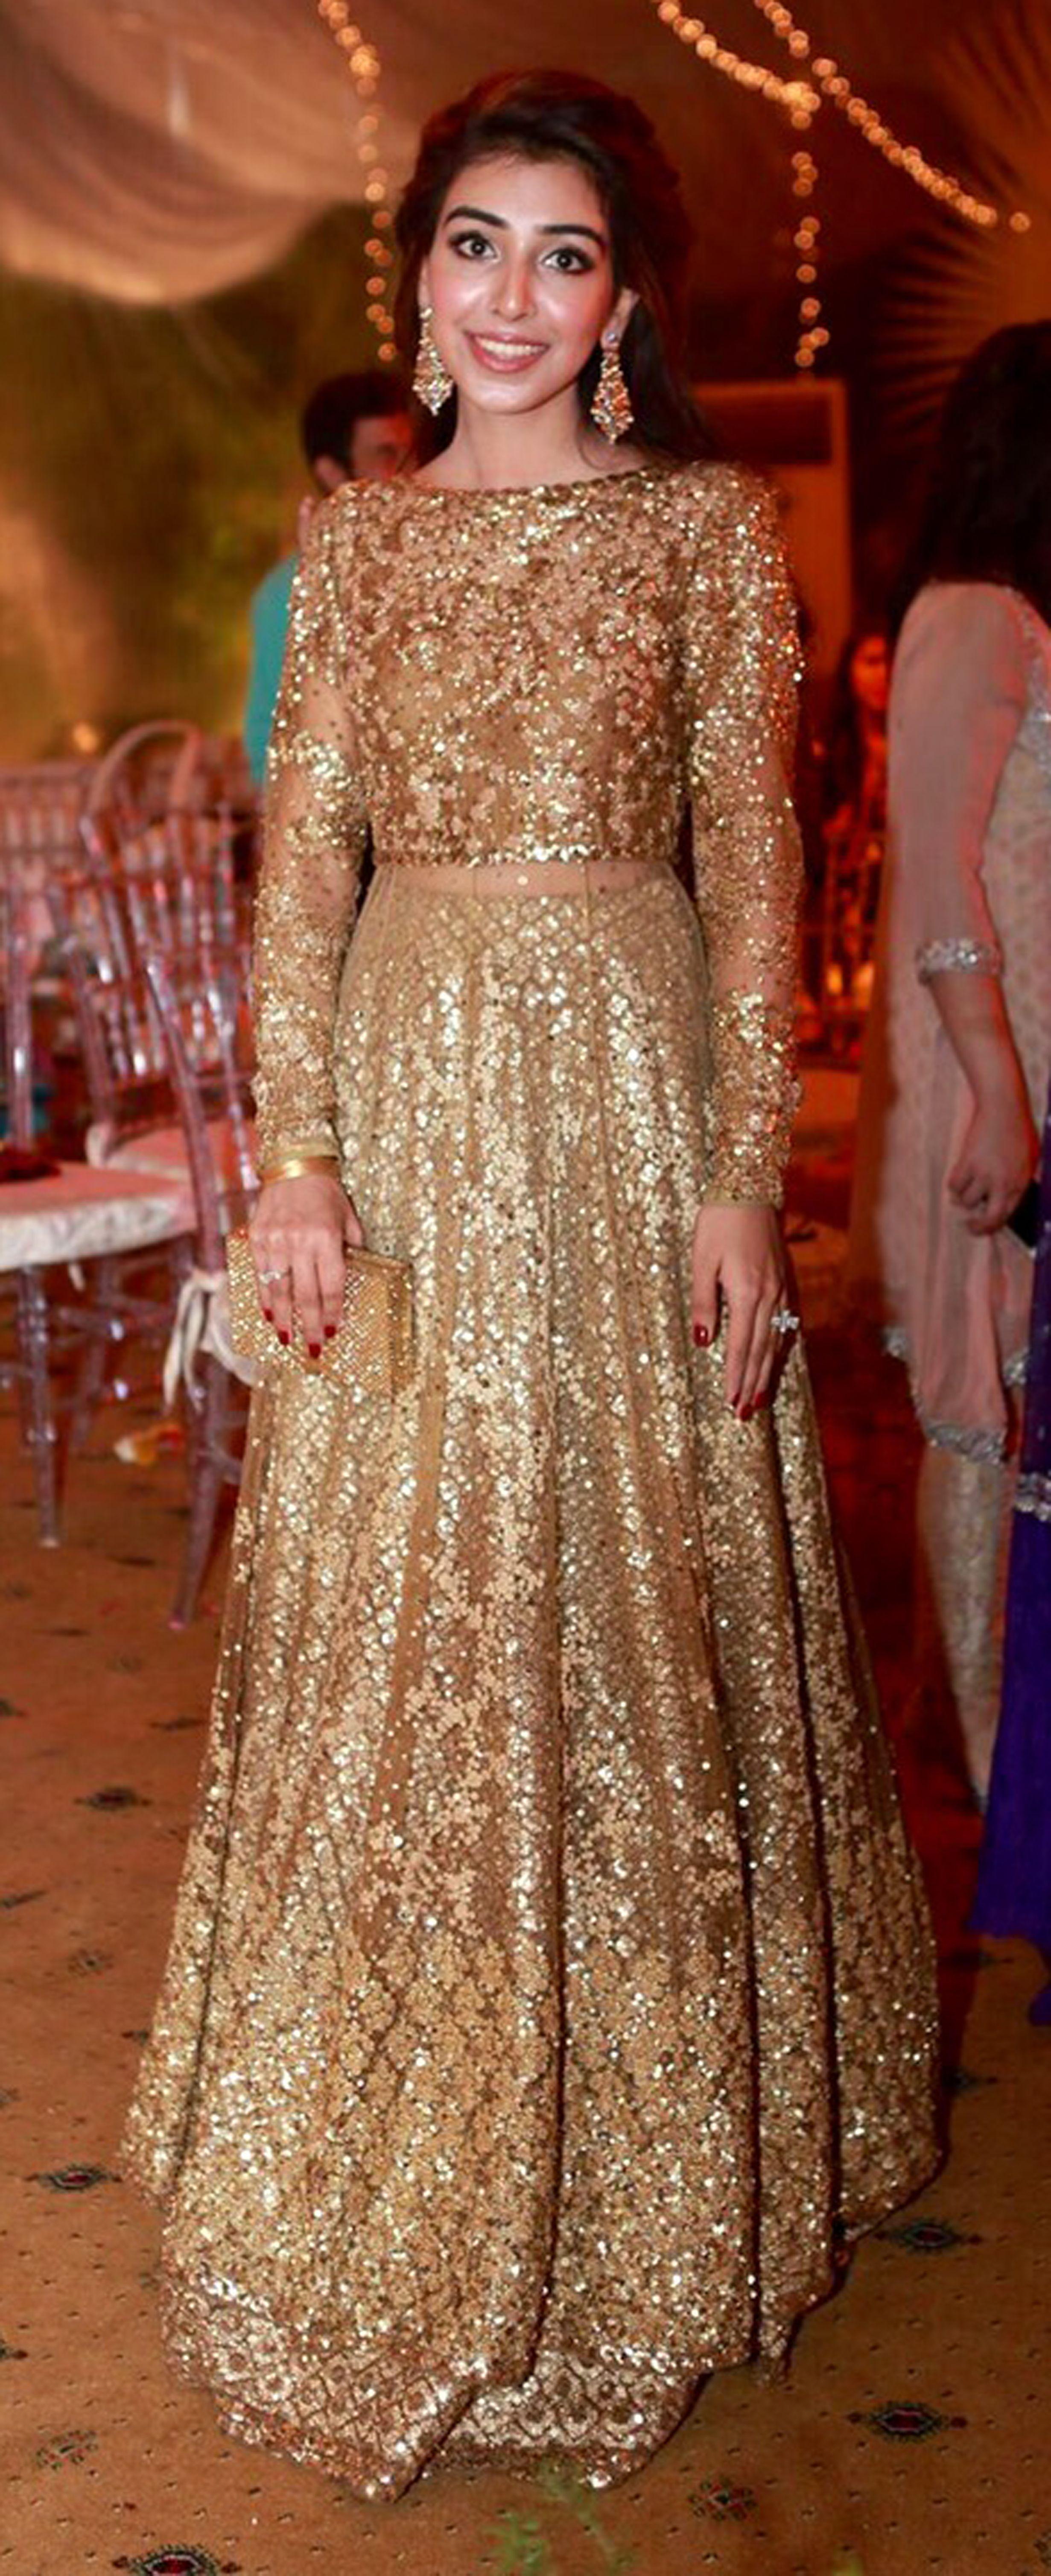 Pin von Zarah Clothing auf zarah Indian lehengas | Pinterest ...